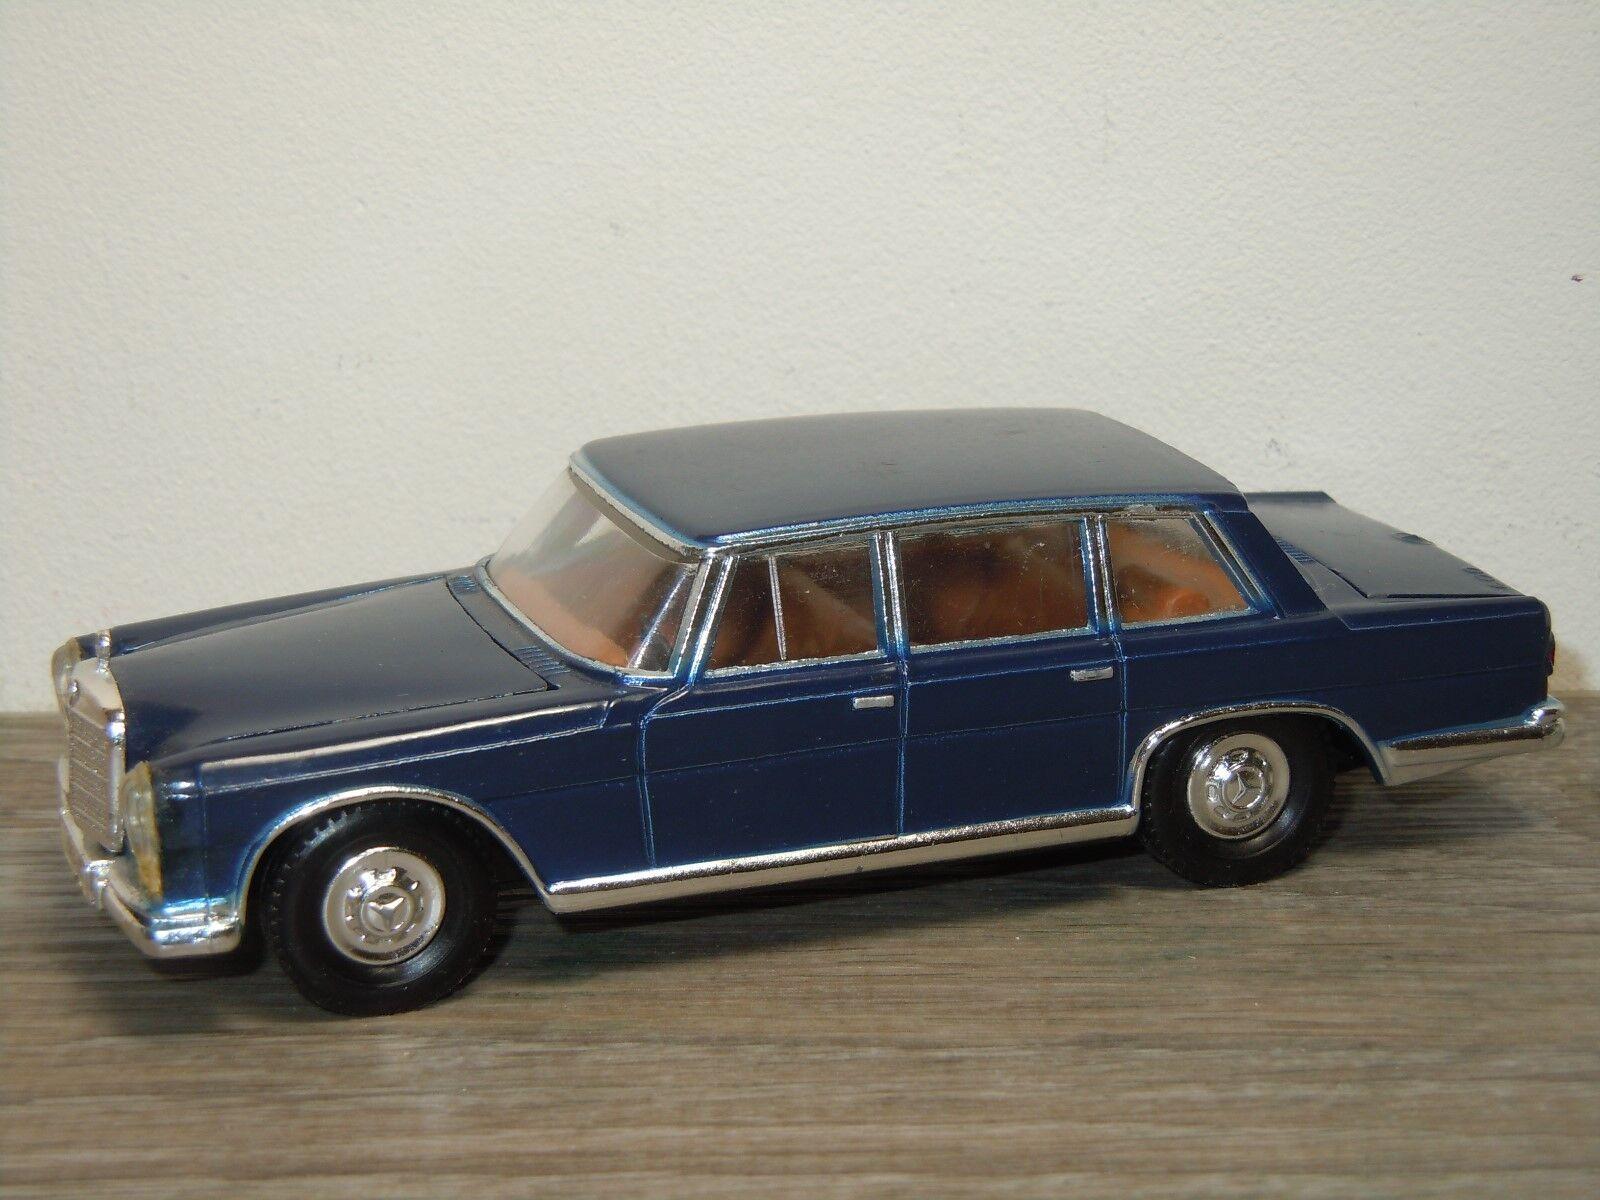 Mercedes  600 Pullhomme - RW Modell Gerhommey 1 43 34365  magasin d'usine de sortie